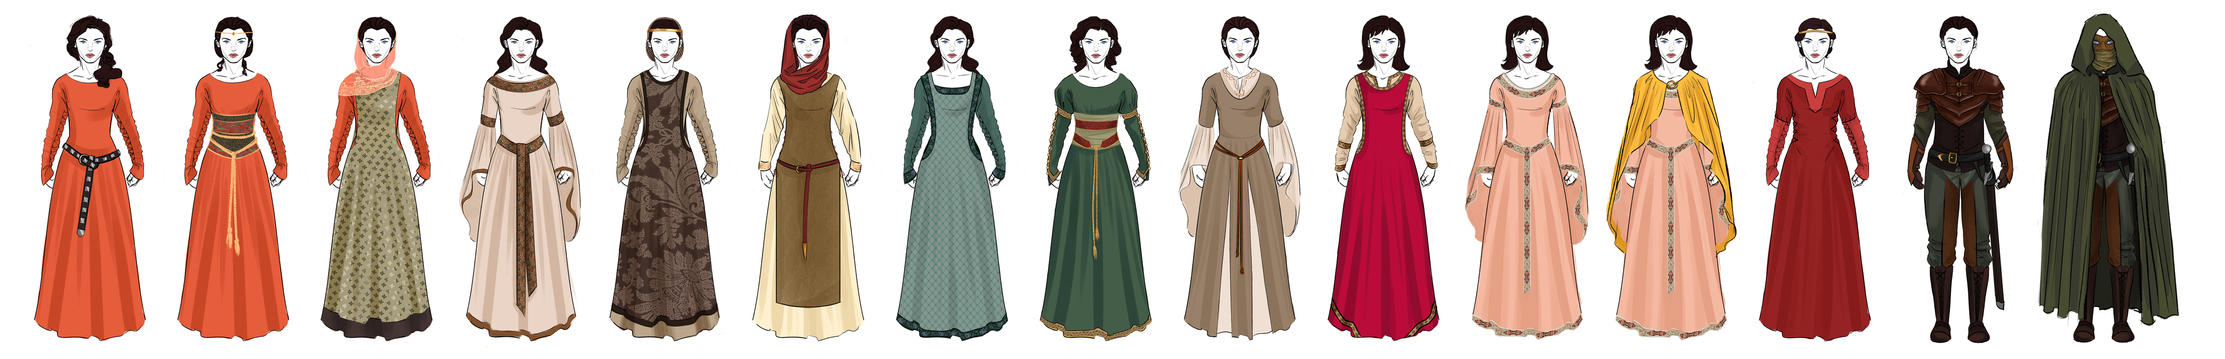 S1 Marian Redesigns - BBC Robin Hood by OtakuGirl16